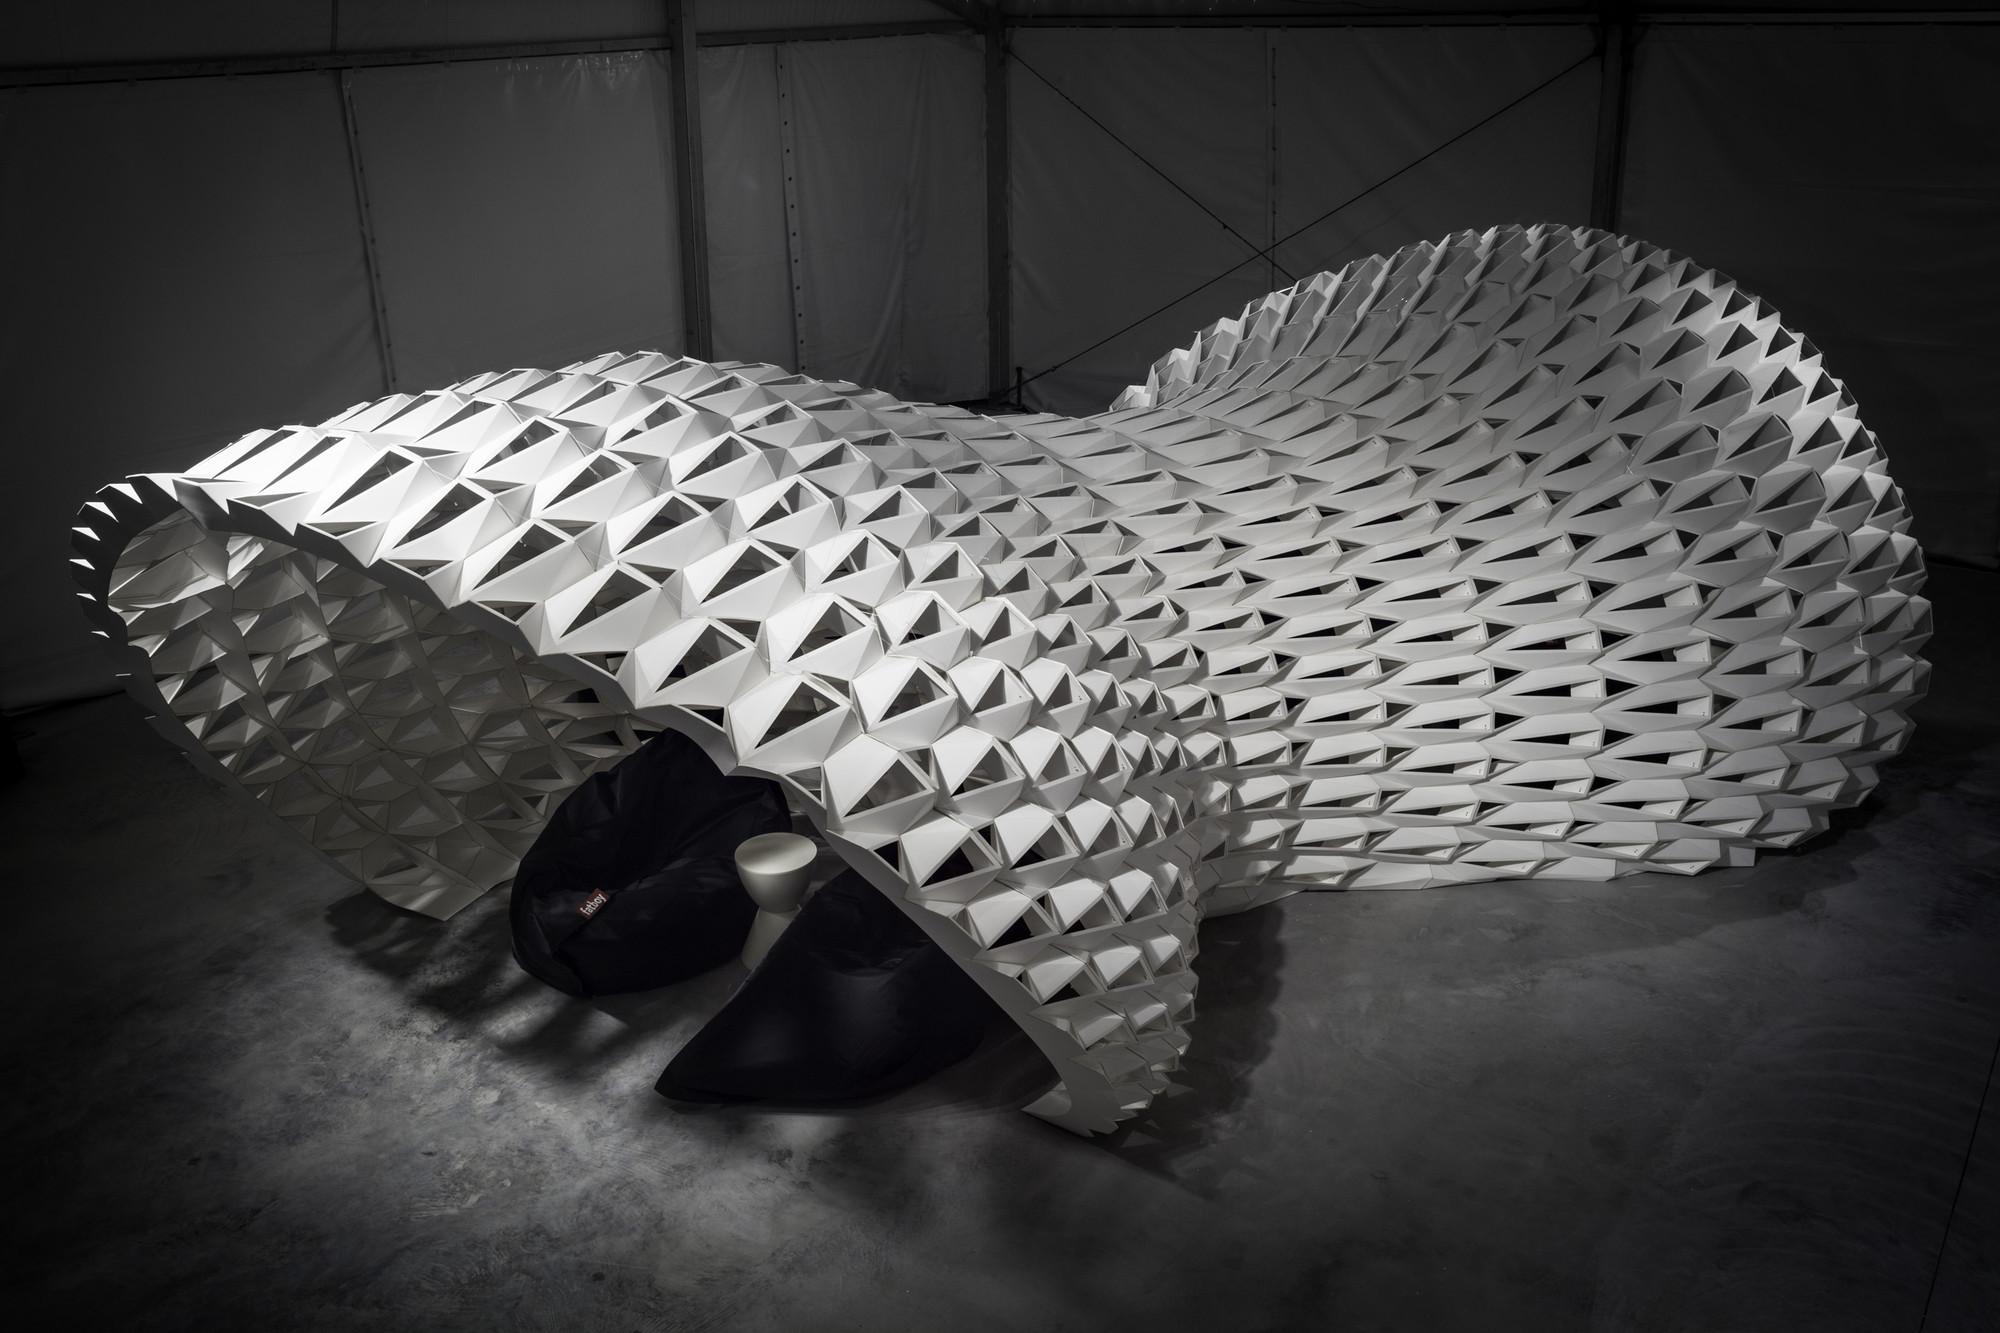 Instalación 'FXFOWLE Lounge' / FXFOWLE Architects, © FXFOWLE Architects